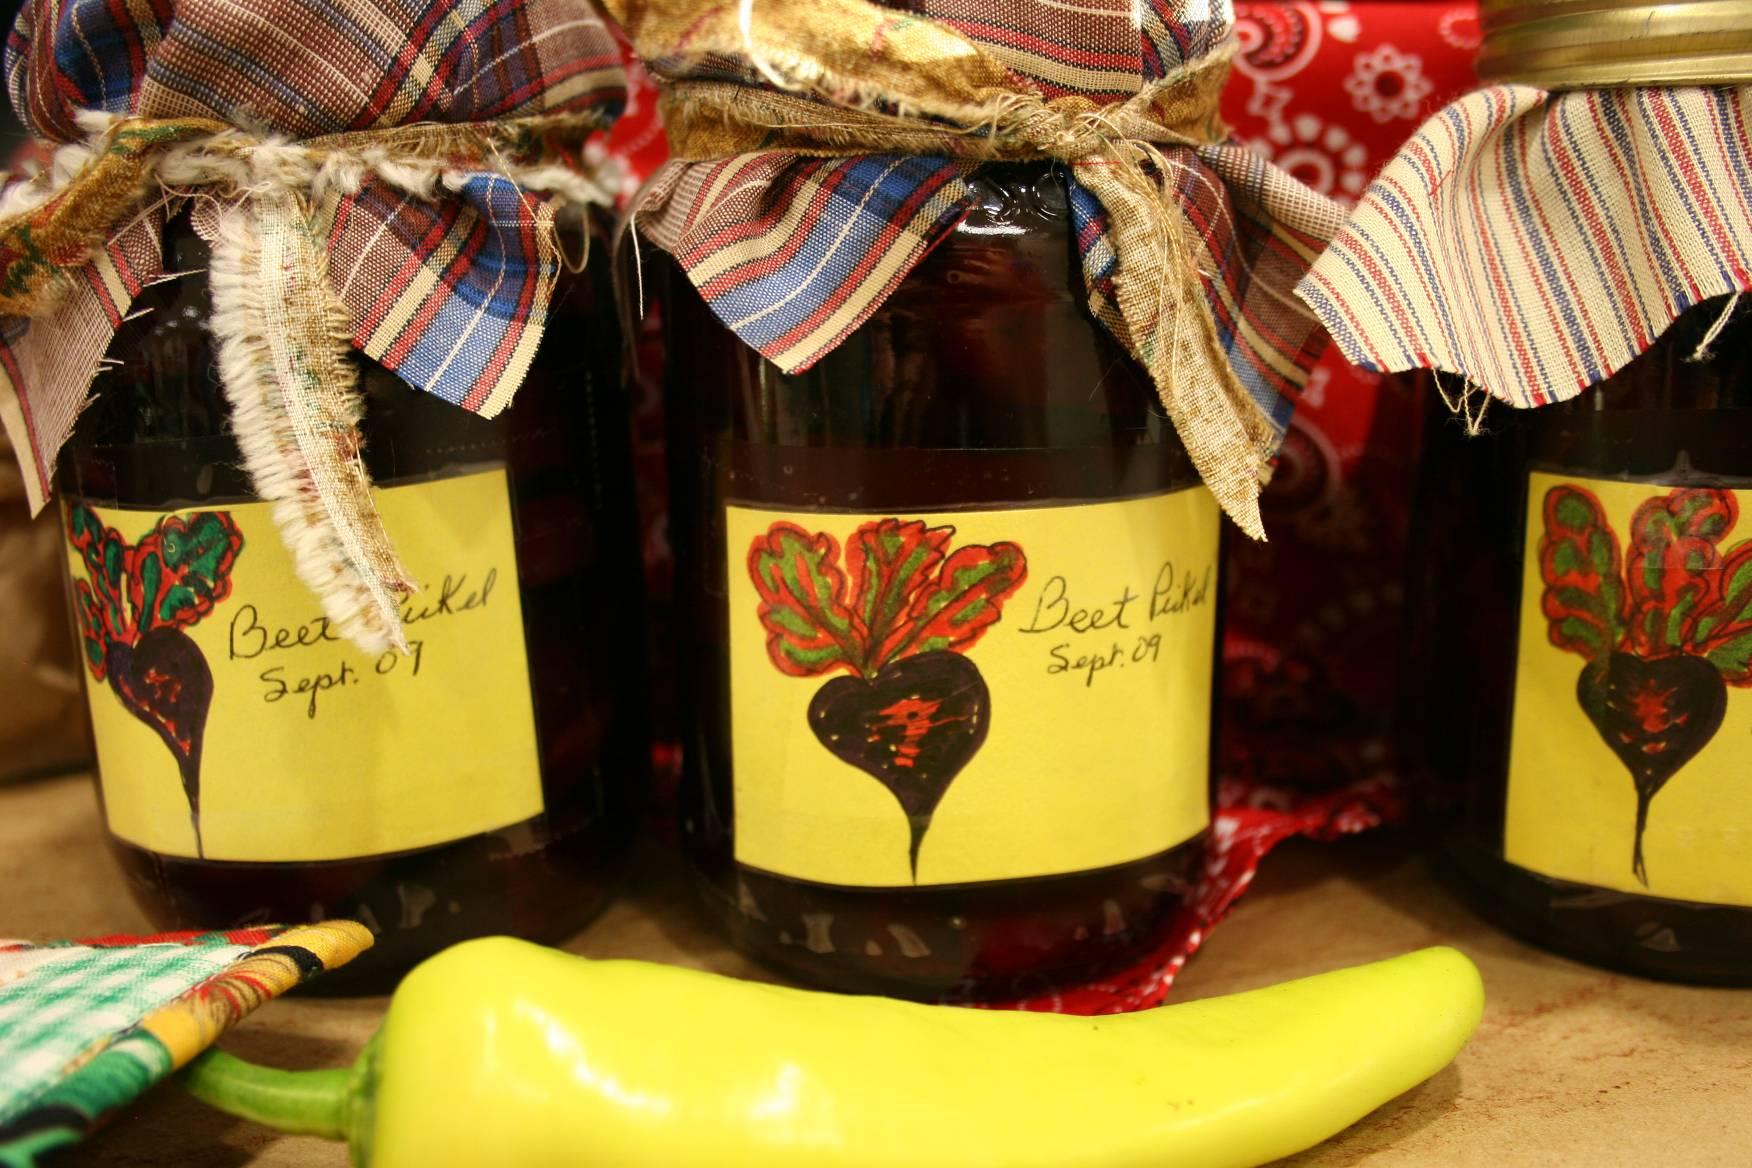 Jars of pickled beets on display.